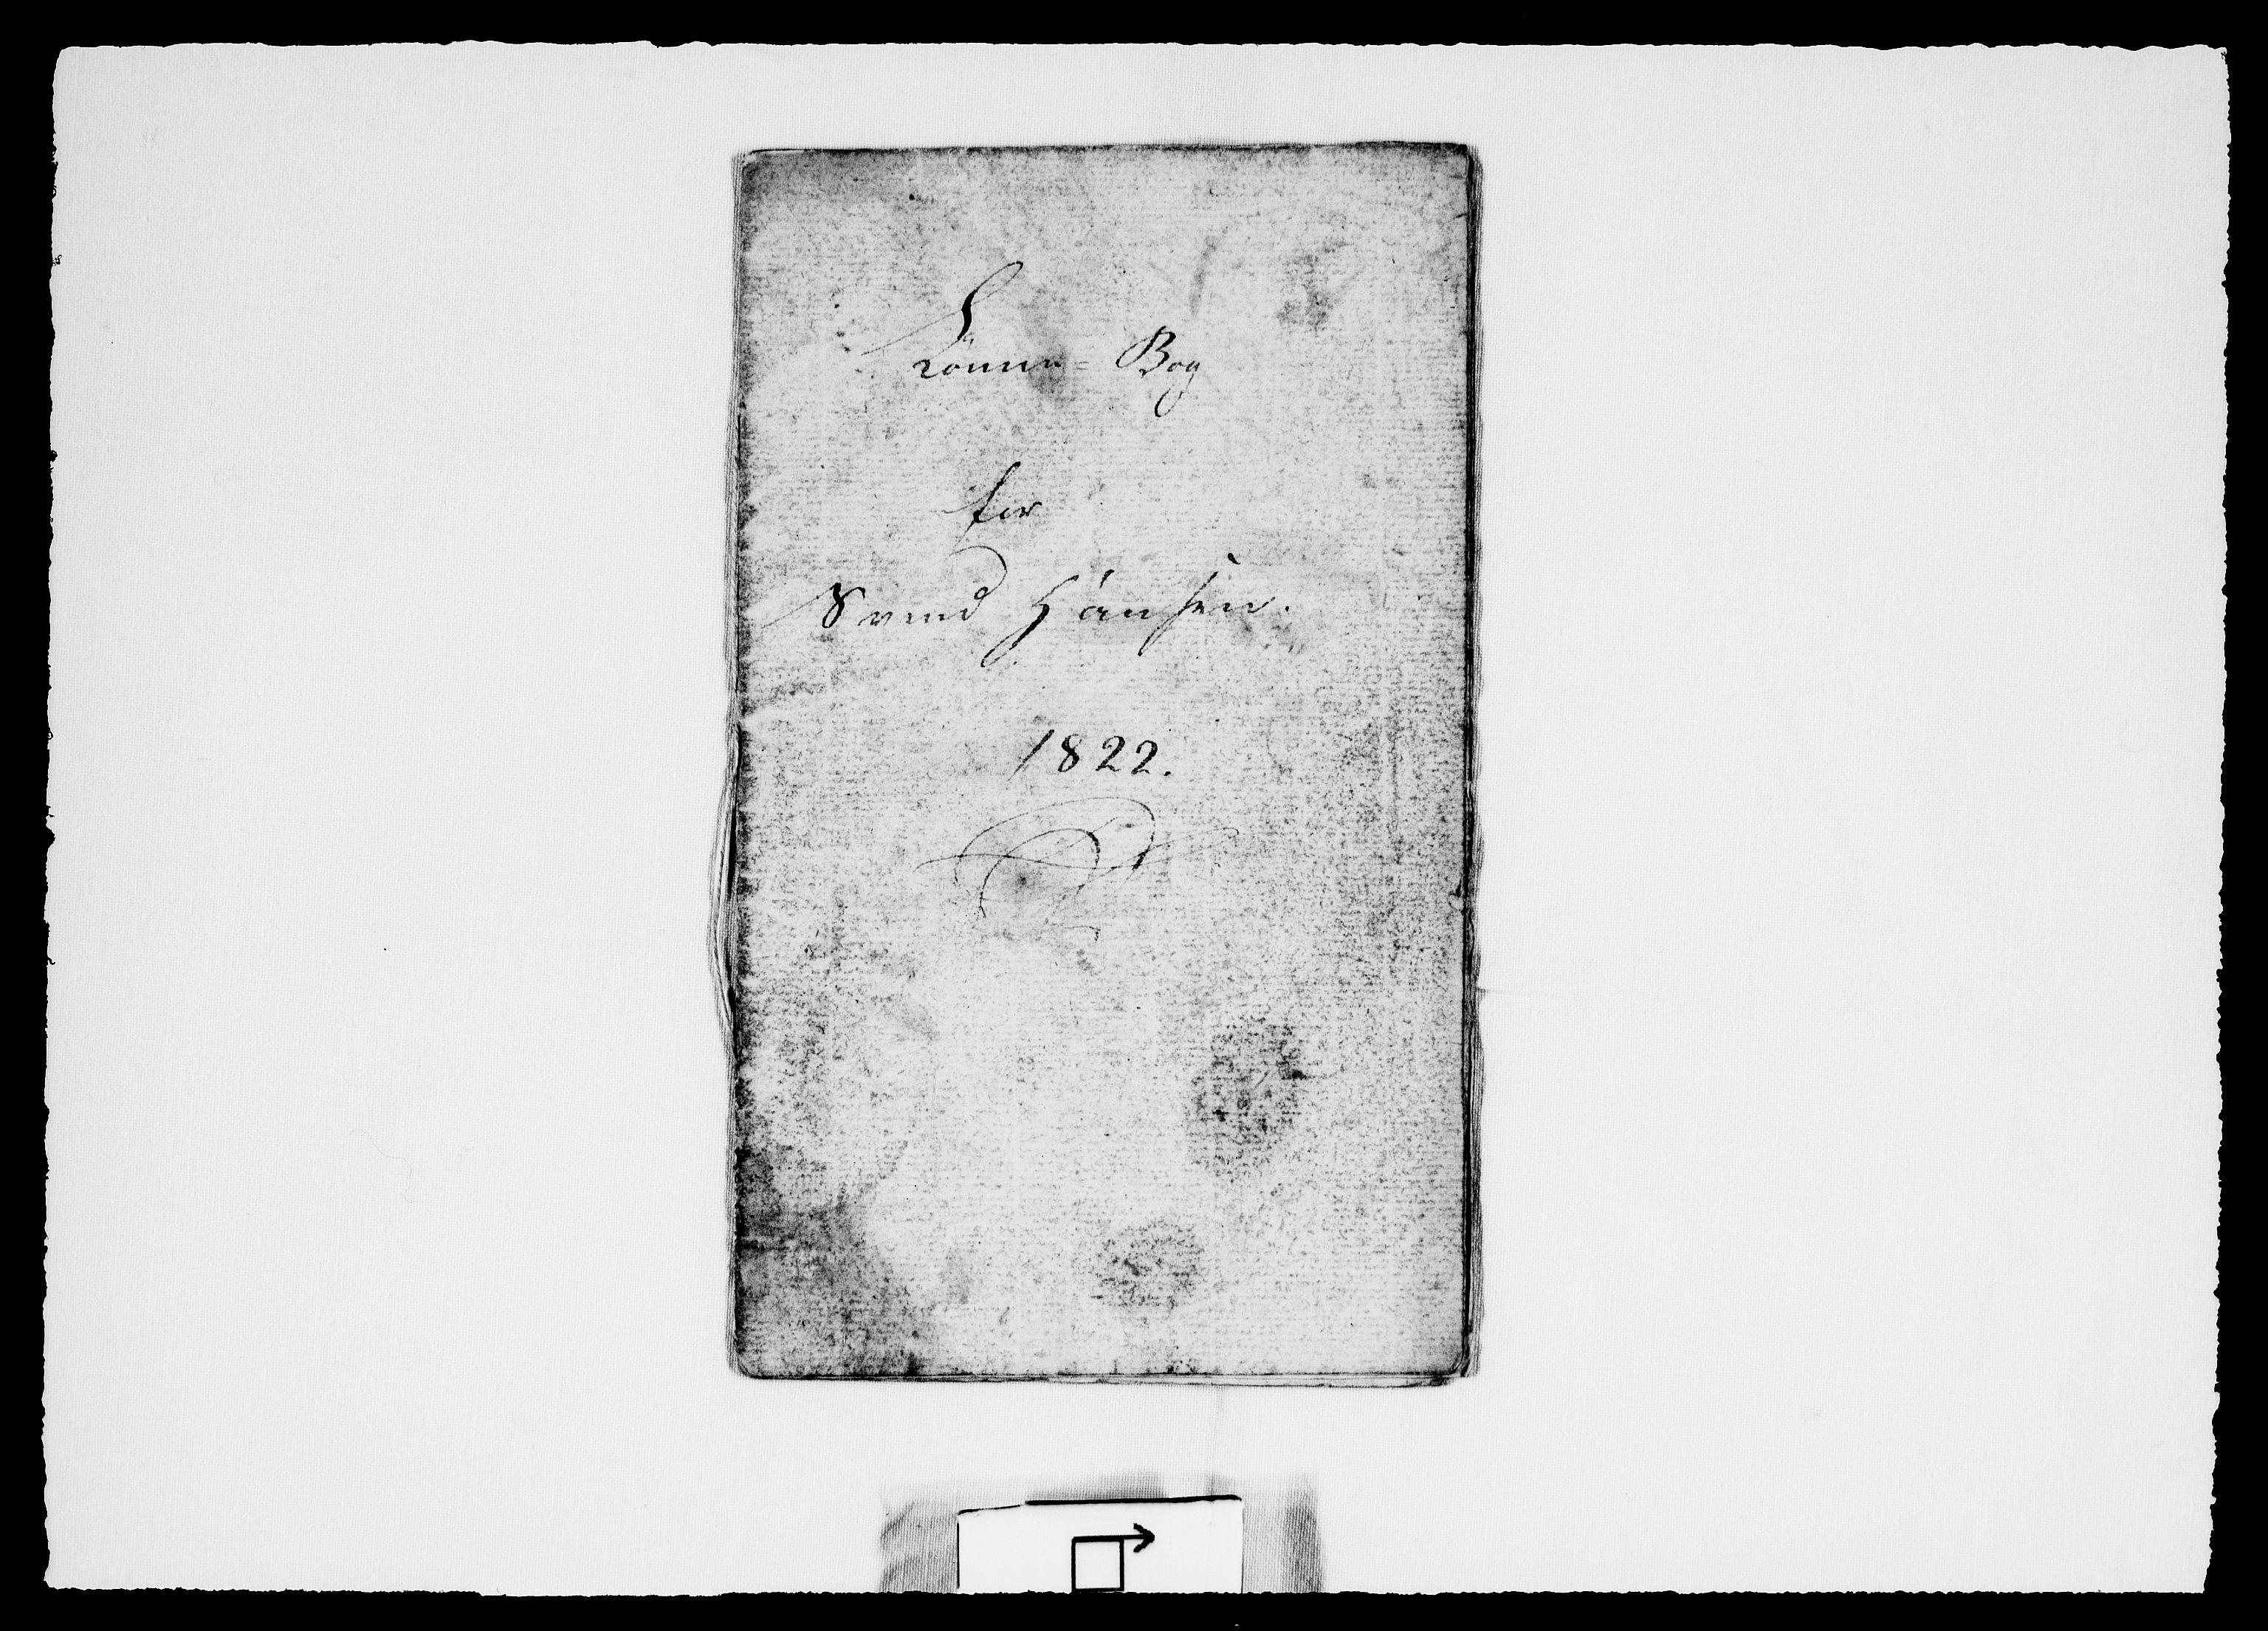 RA, Modums Blaafarveværk, G/Gd/Gdd/L0297, 1822-1839, s. 2